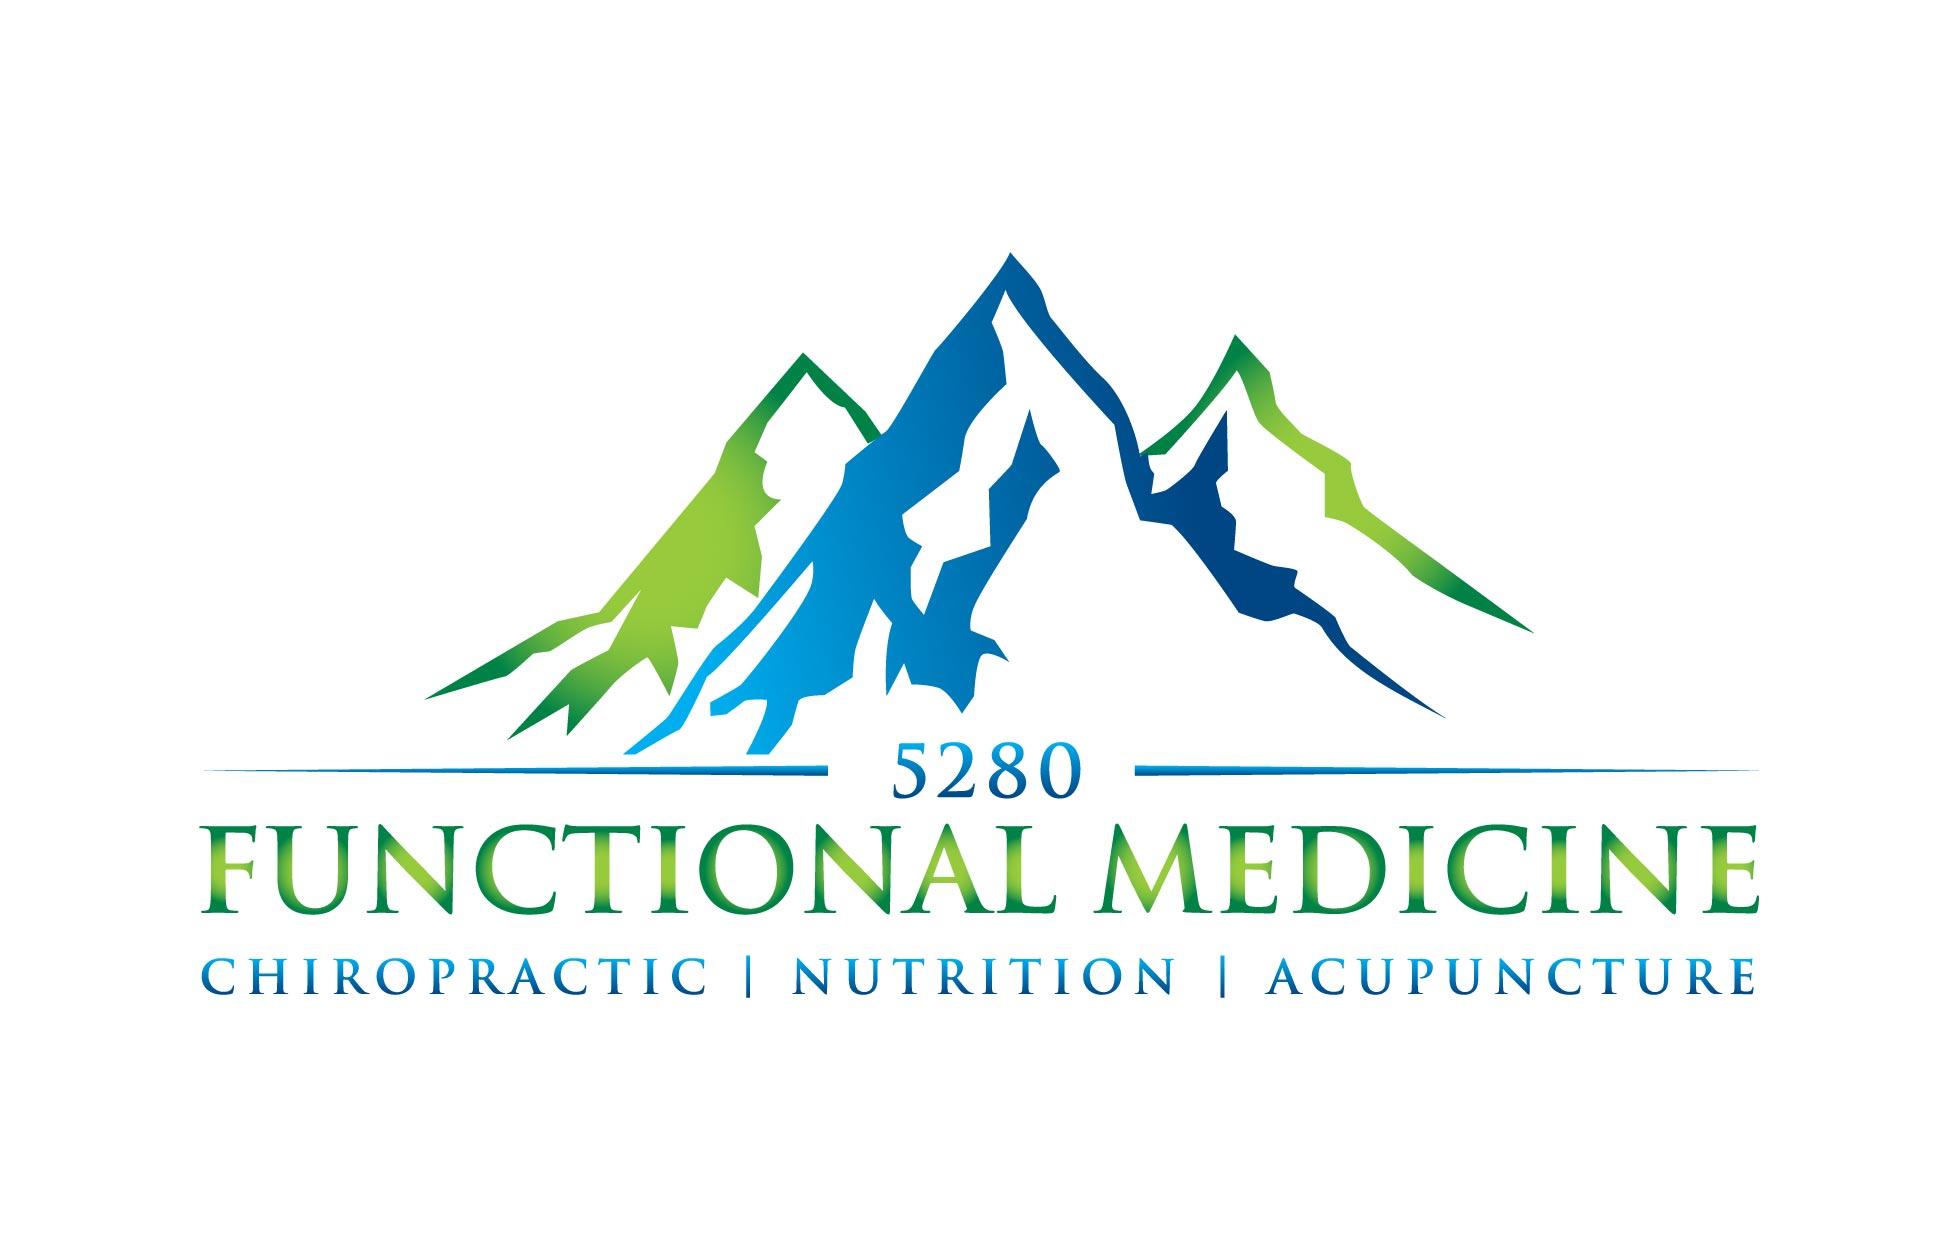 5280 Functional Medicine